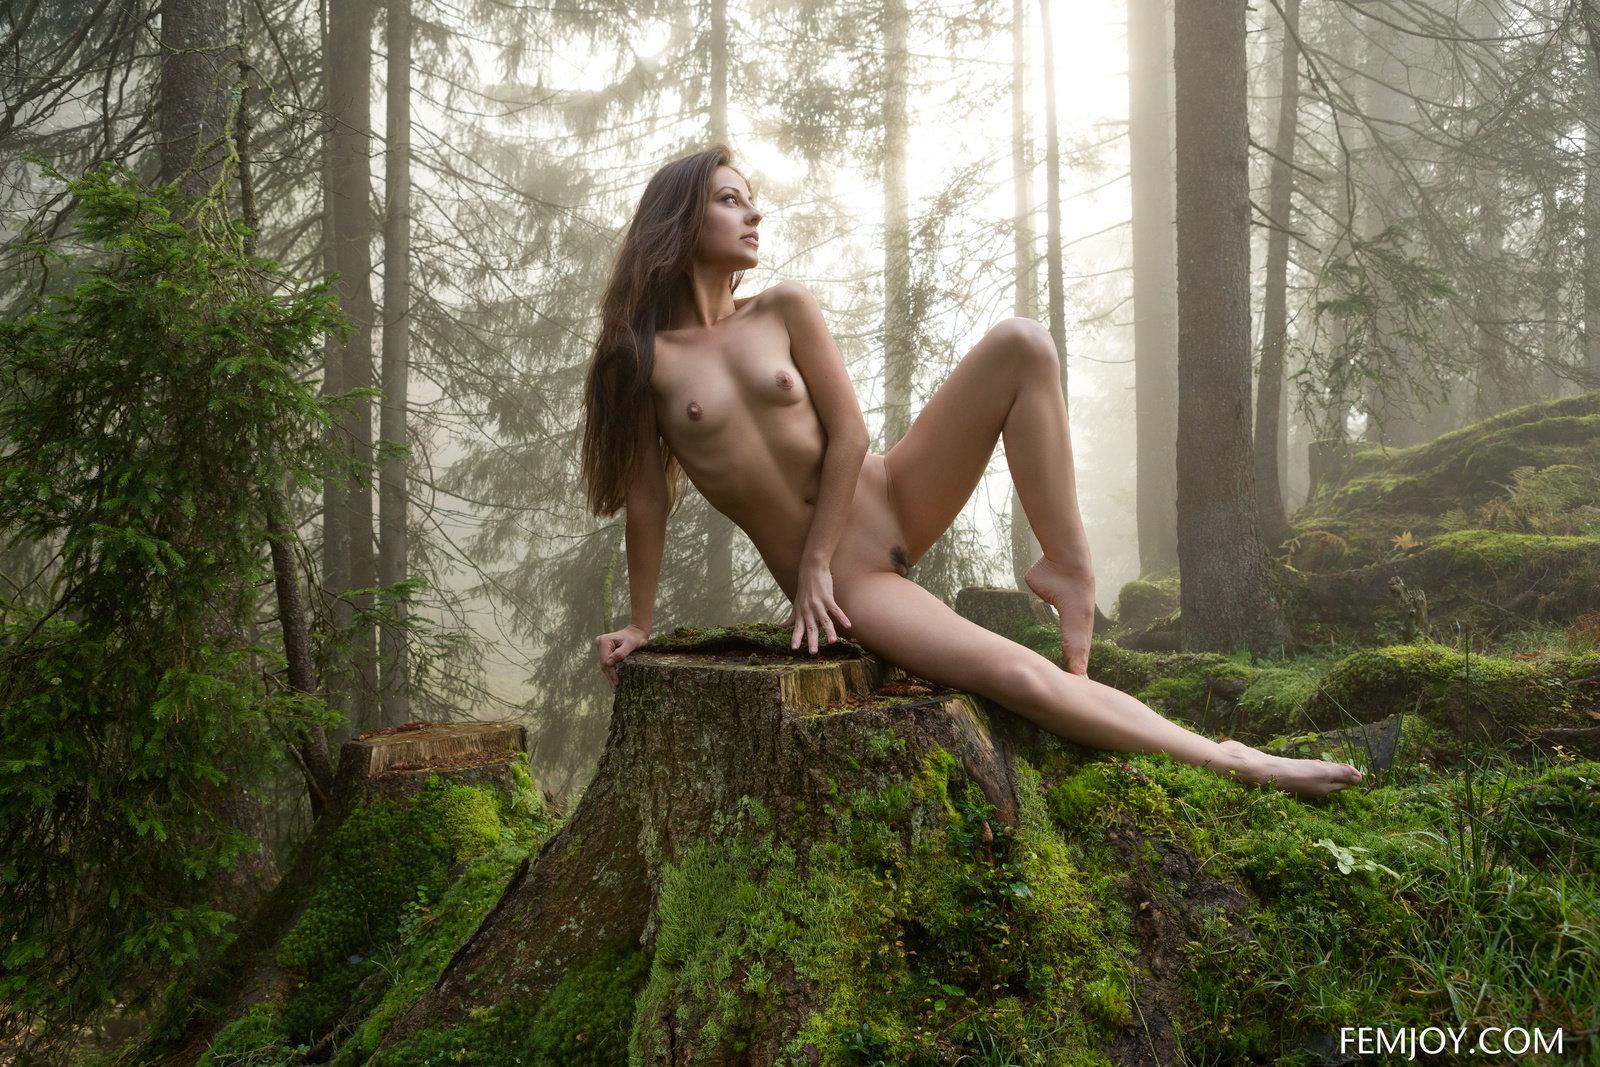 Petite Beauty Lorena Posing Nude On Mystical Foggy Morning By Femjoy 16 Photos  Erotic Beauties-6001